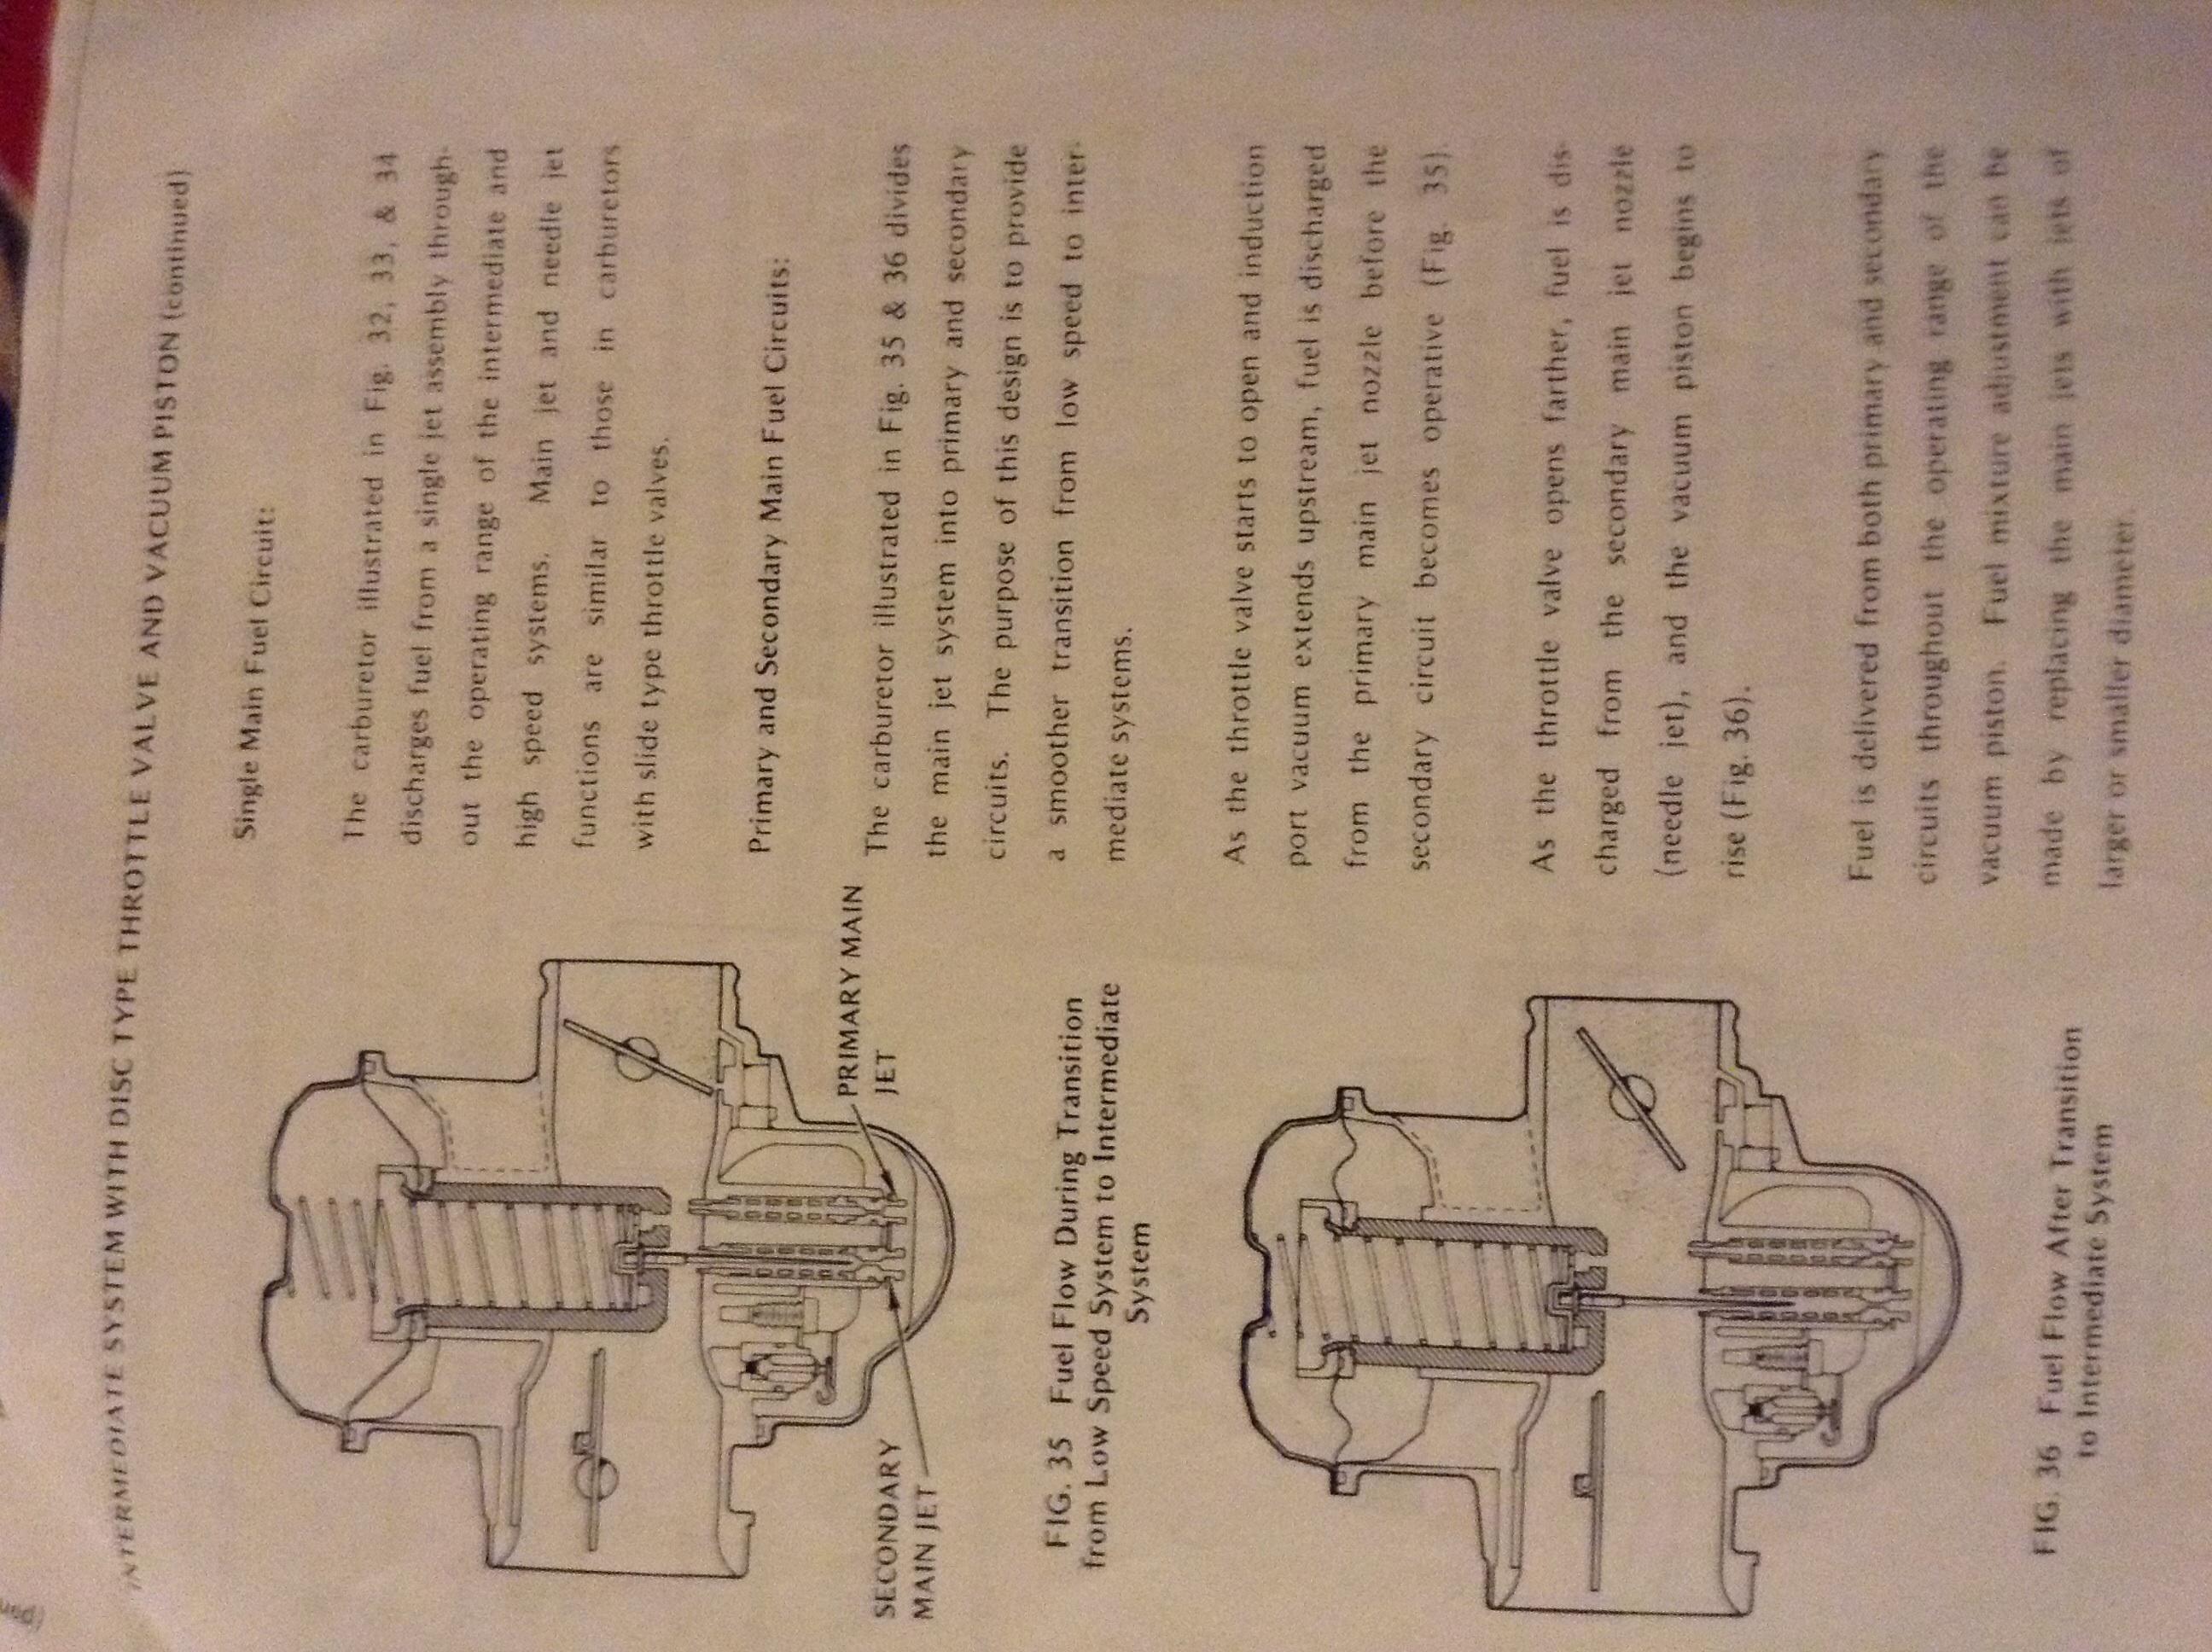 Cv Carb Circuits Keihin Carburetor Diagram In Addition Honda On Image